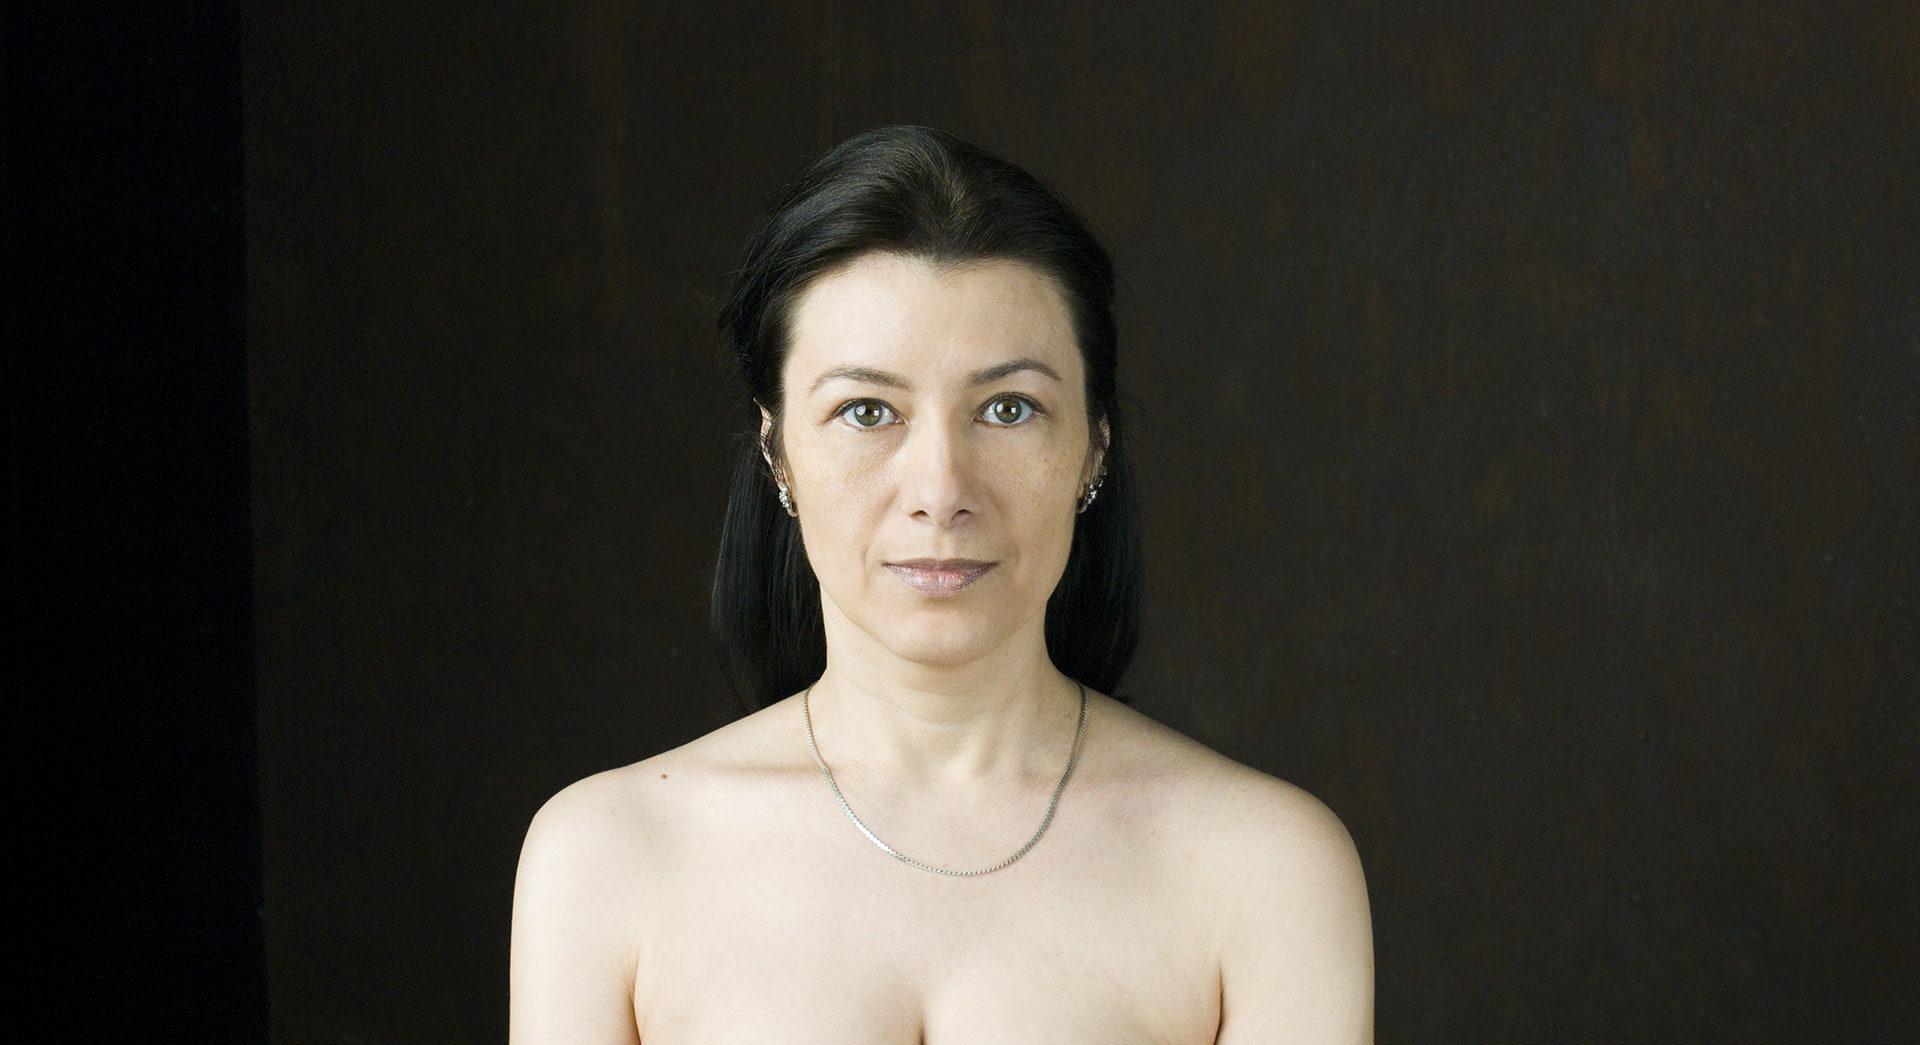 Не прячу взгляд — Блефаропластика — Виталий Жолтиков